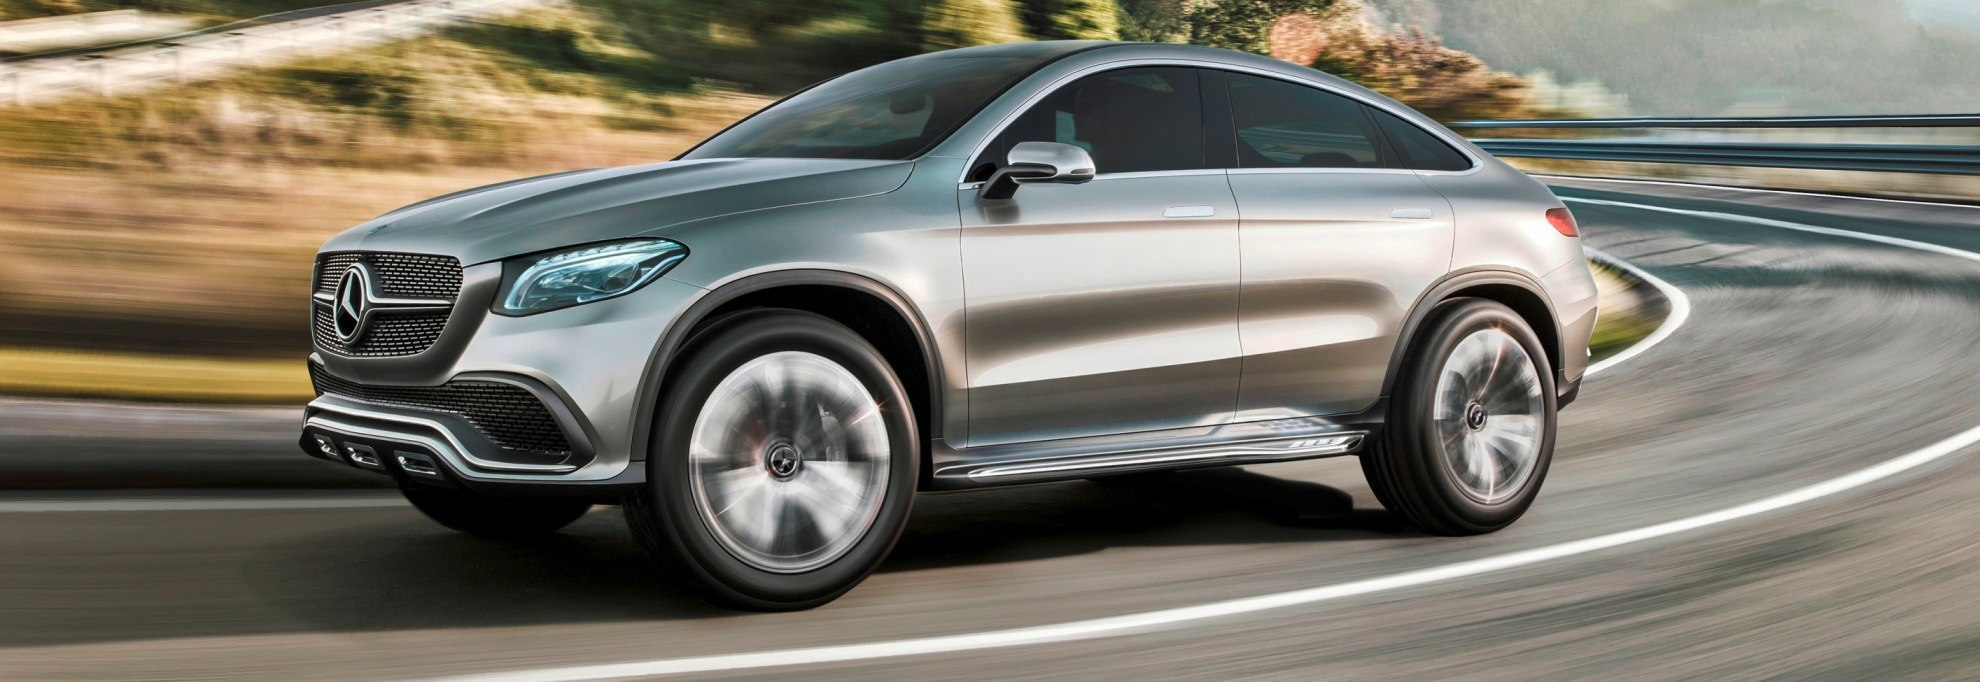 Mercedes Benz Concept Coupe Suv Beijing 2014 Sets New Design 2017 2018 Ca